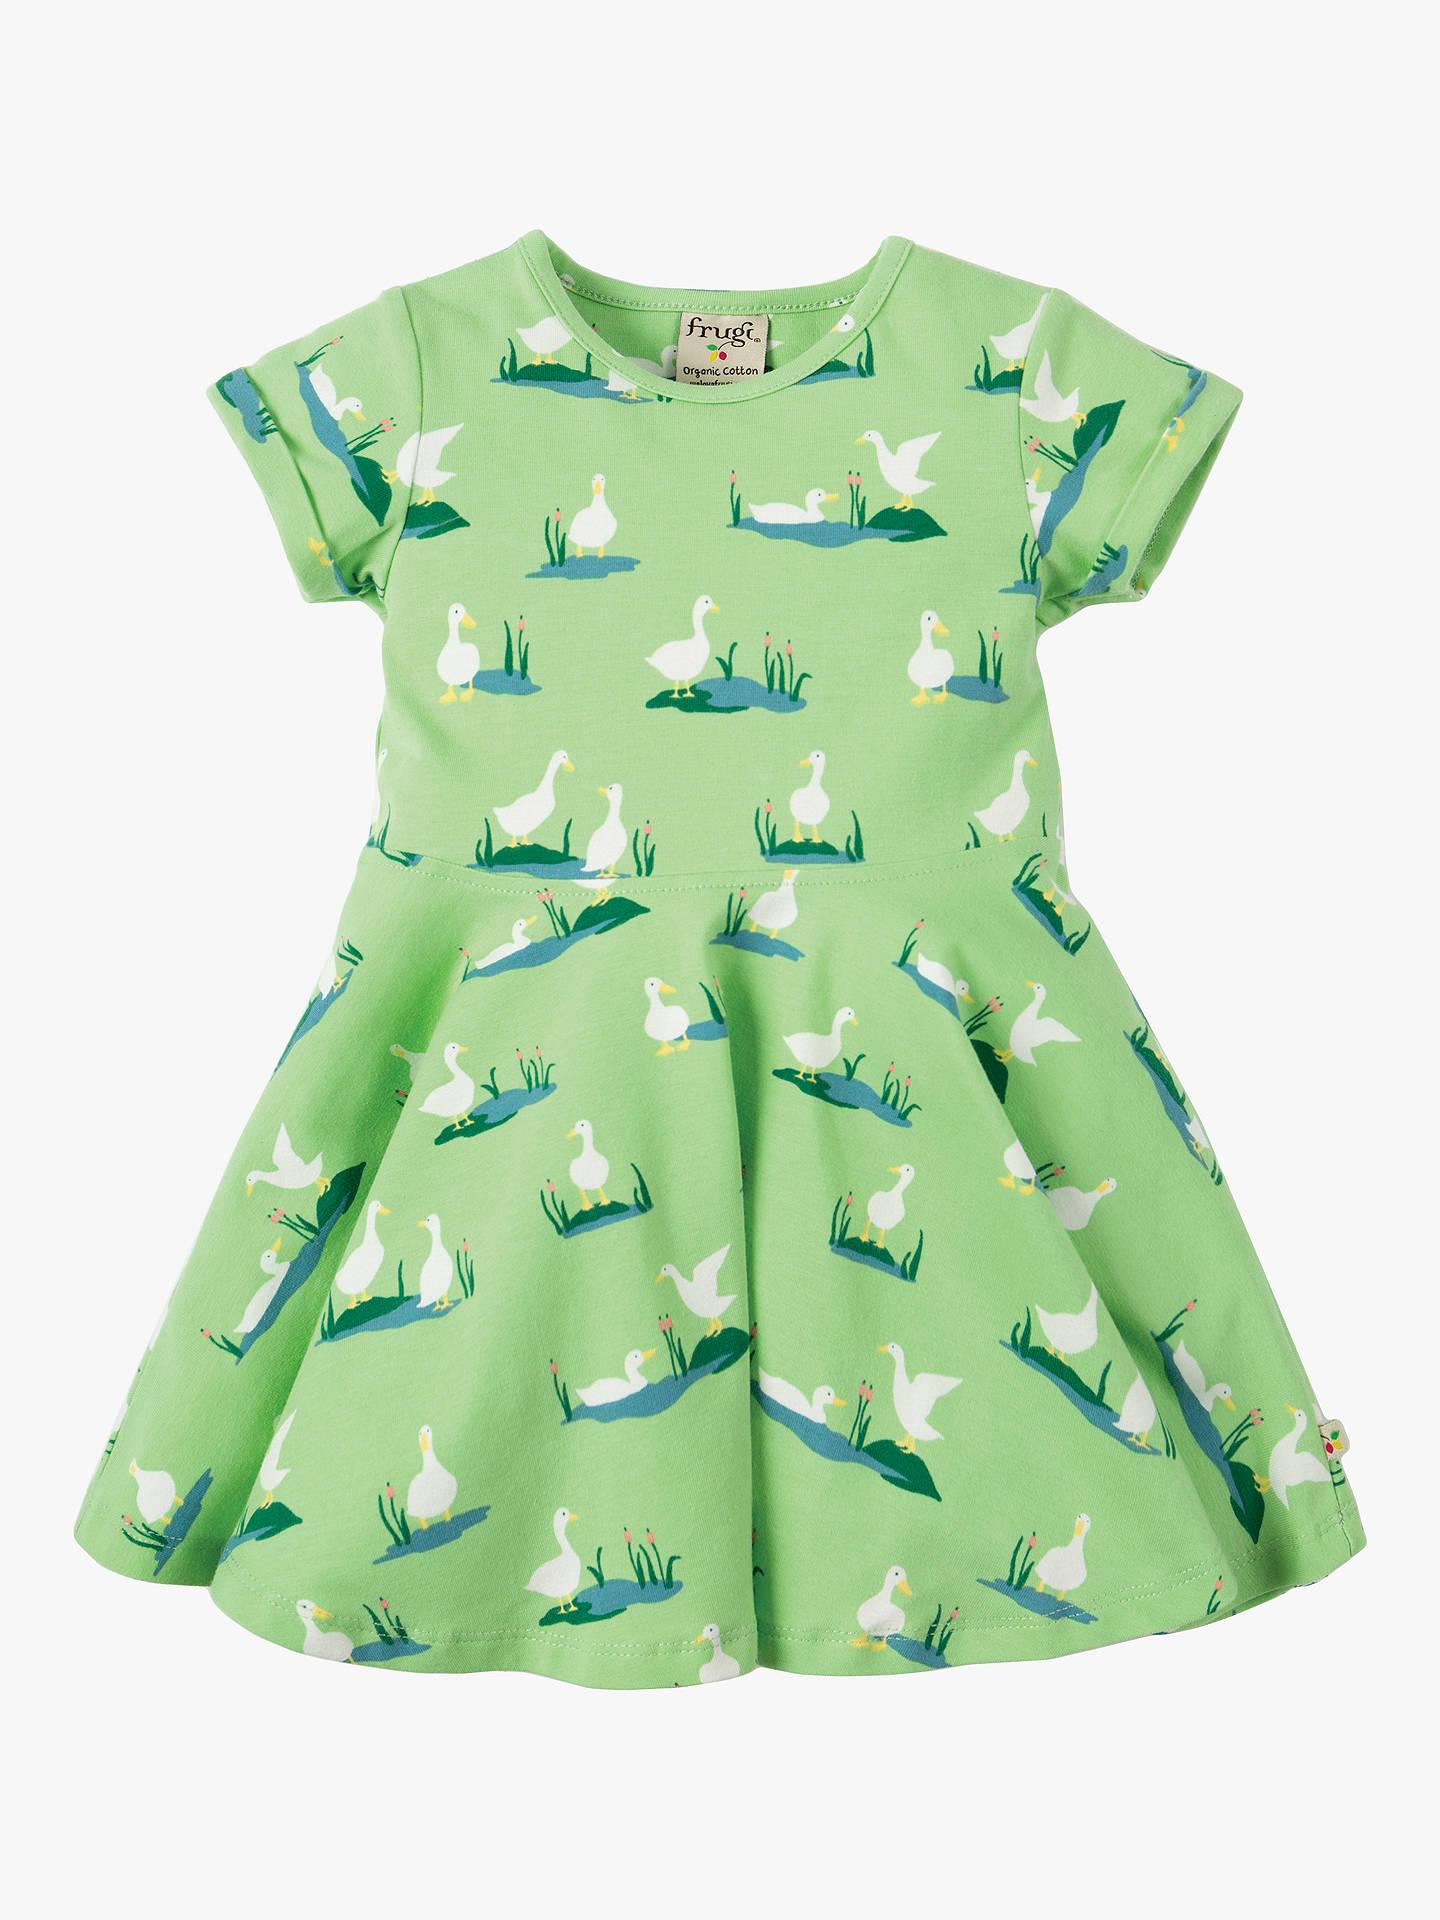 8ca584f49 Frugi Baby Organic Cotton Spring Dress